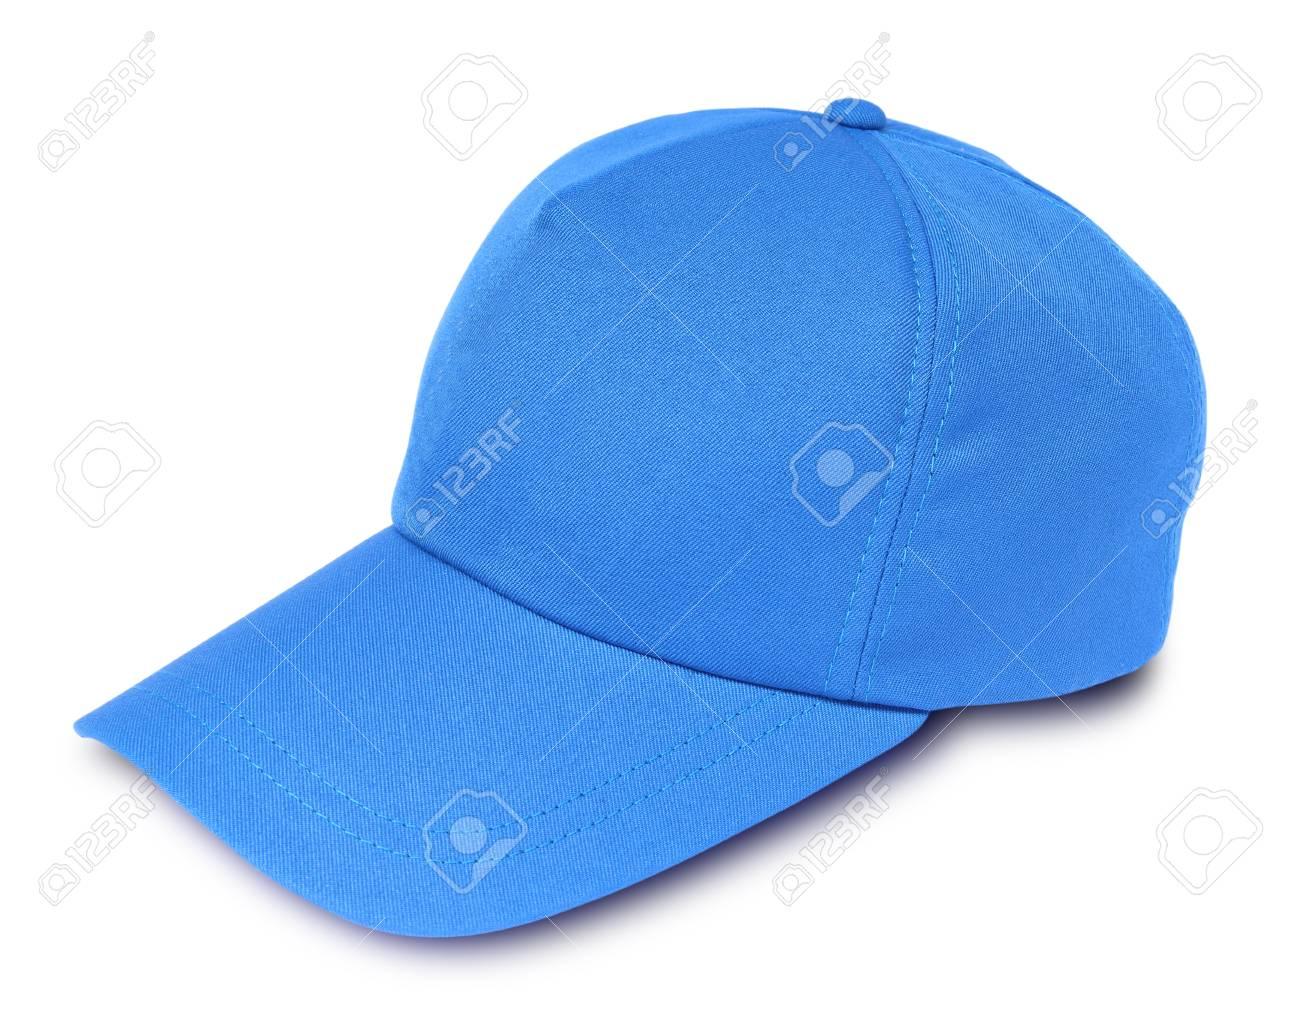 Blue baseball cap isolated on a white background Stock Photo - 61604018 ca3fe605110